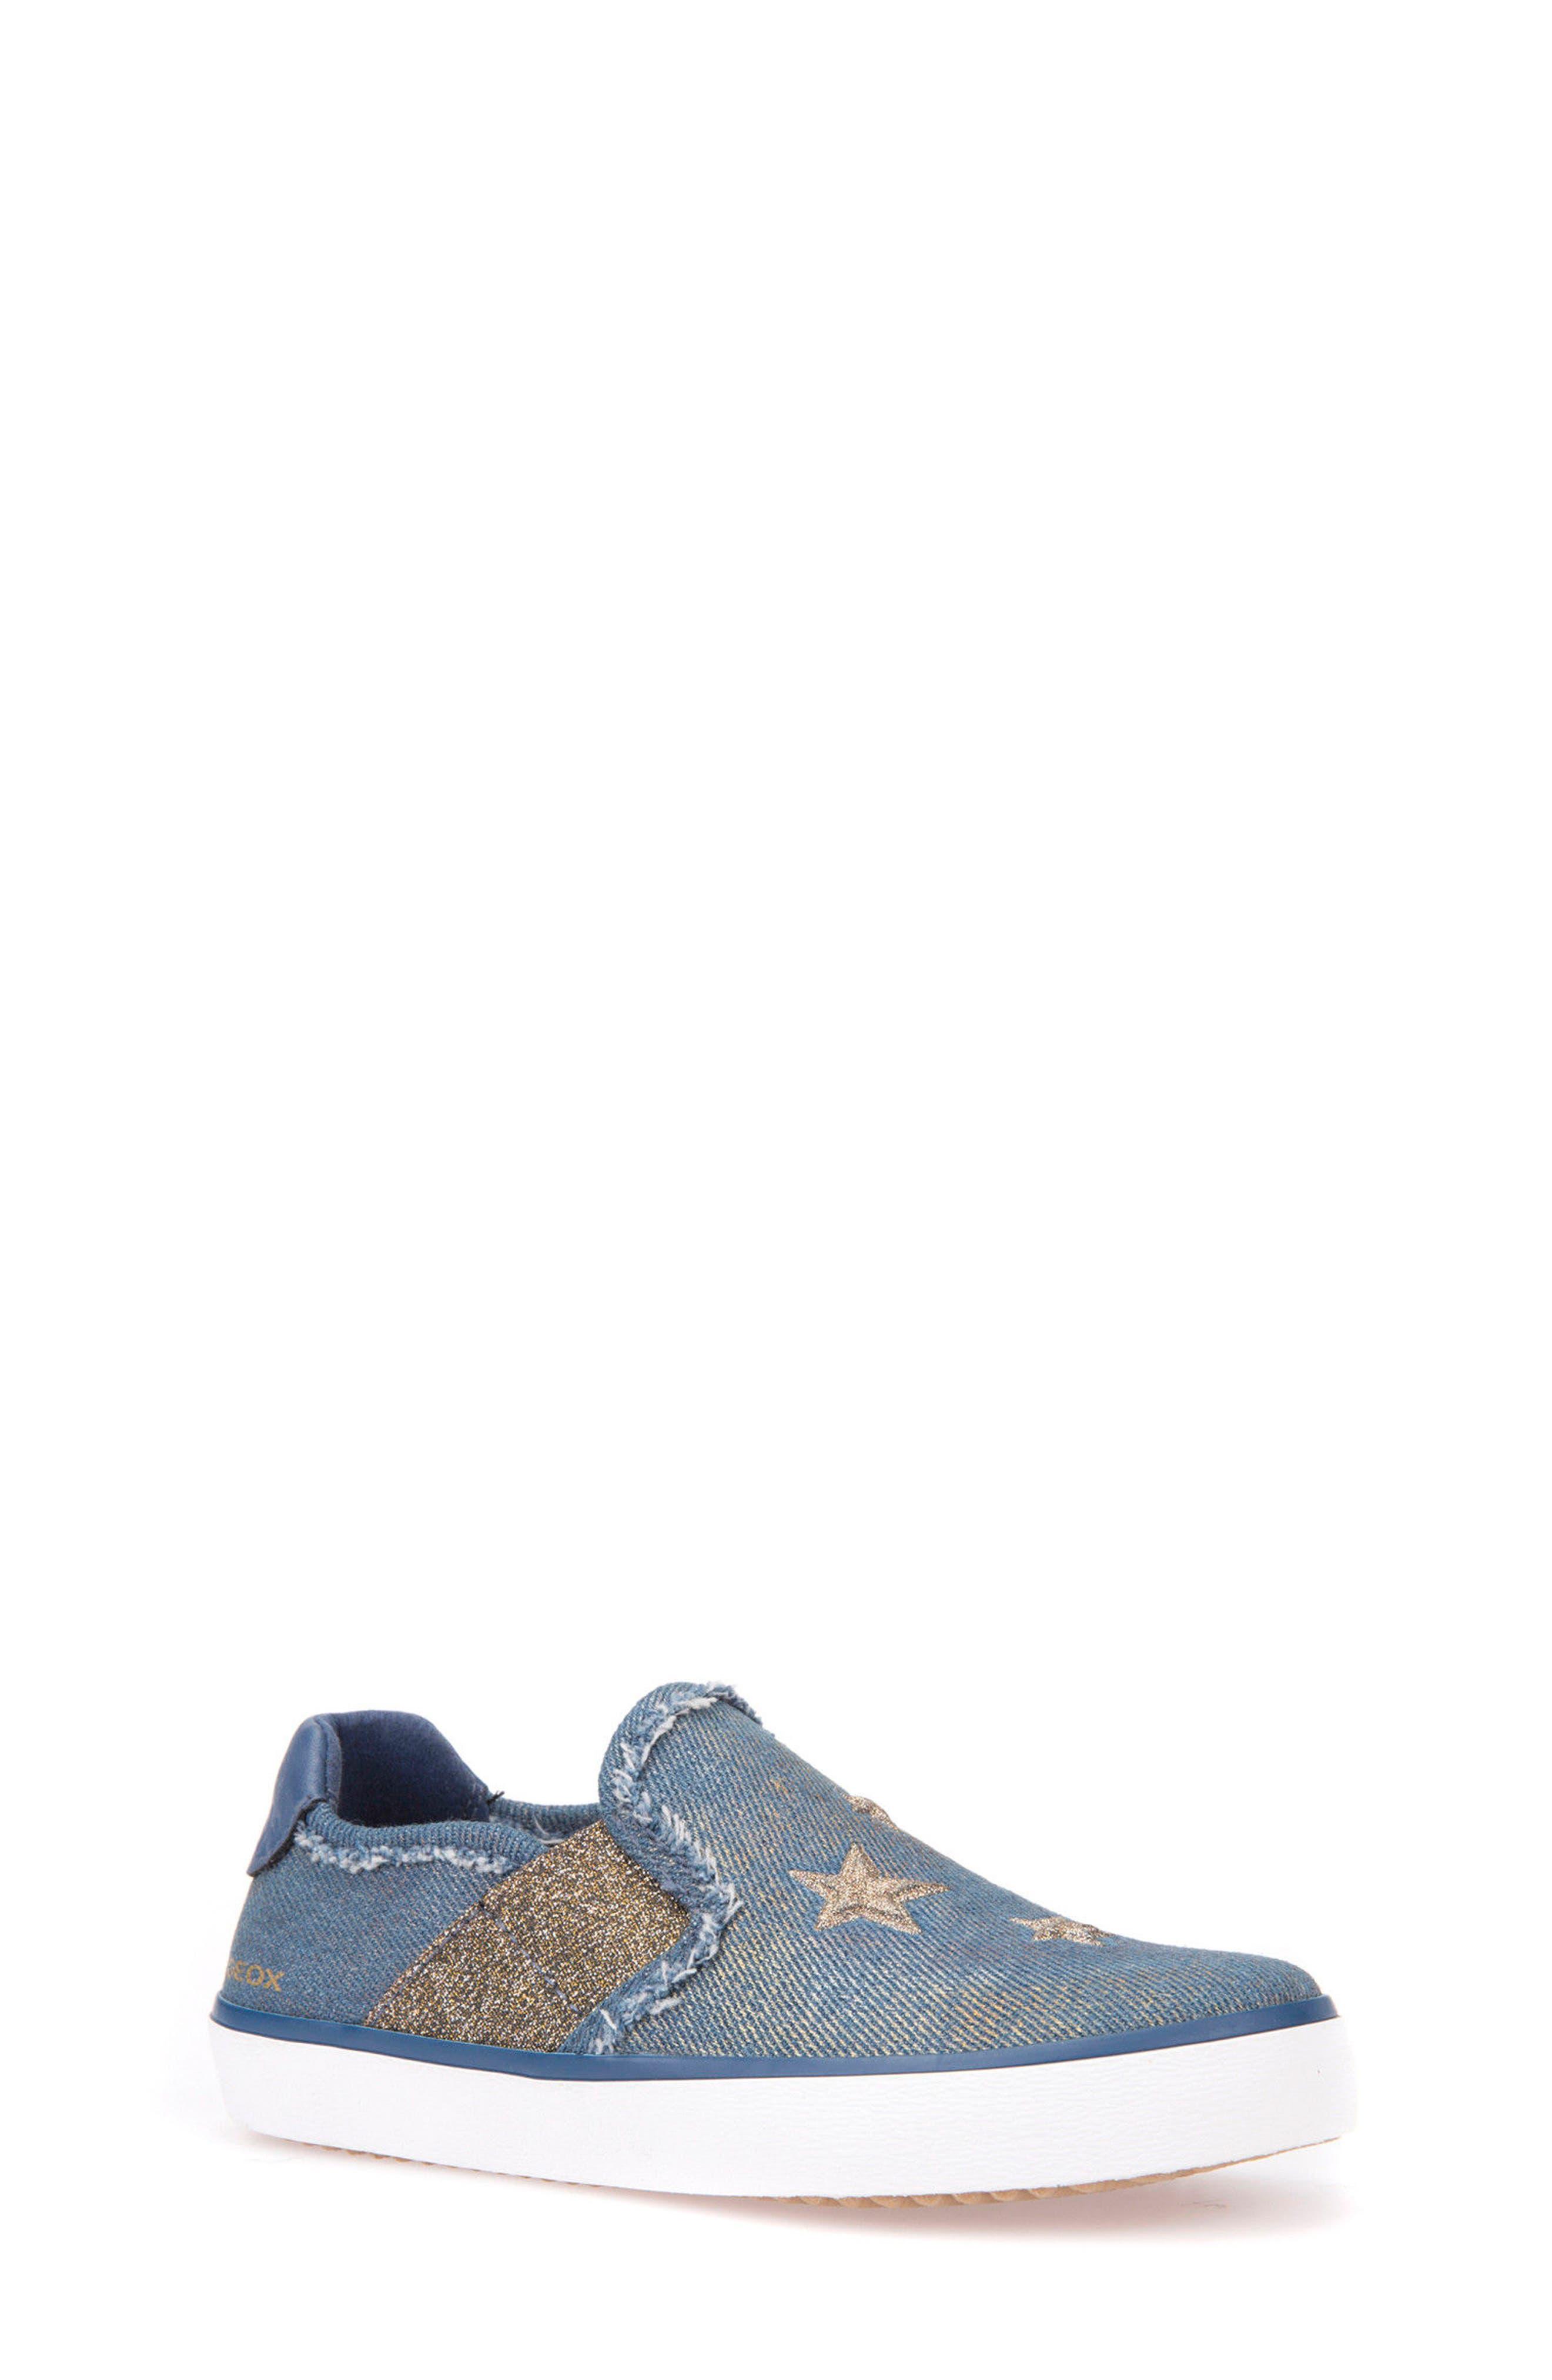 Kilwi Slip-On Sneaker,                             Main thumbnail 1, color,                             AVIO